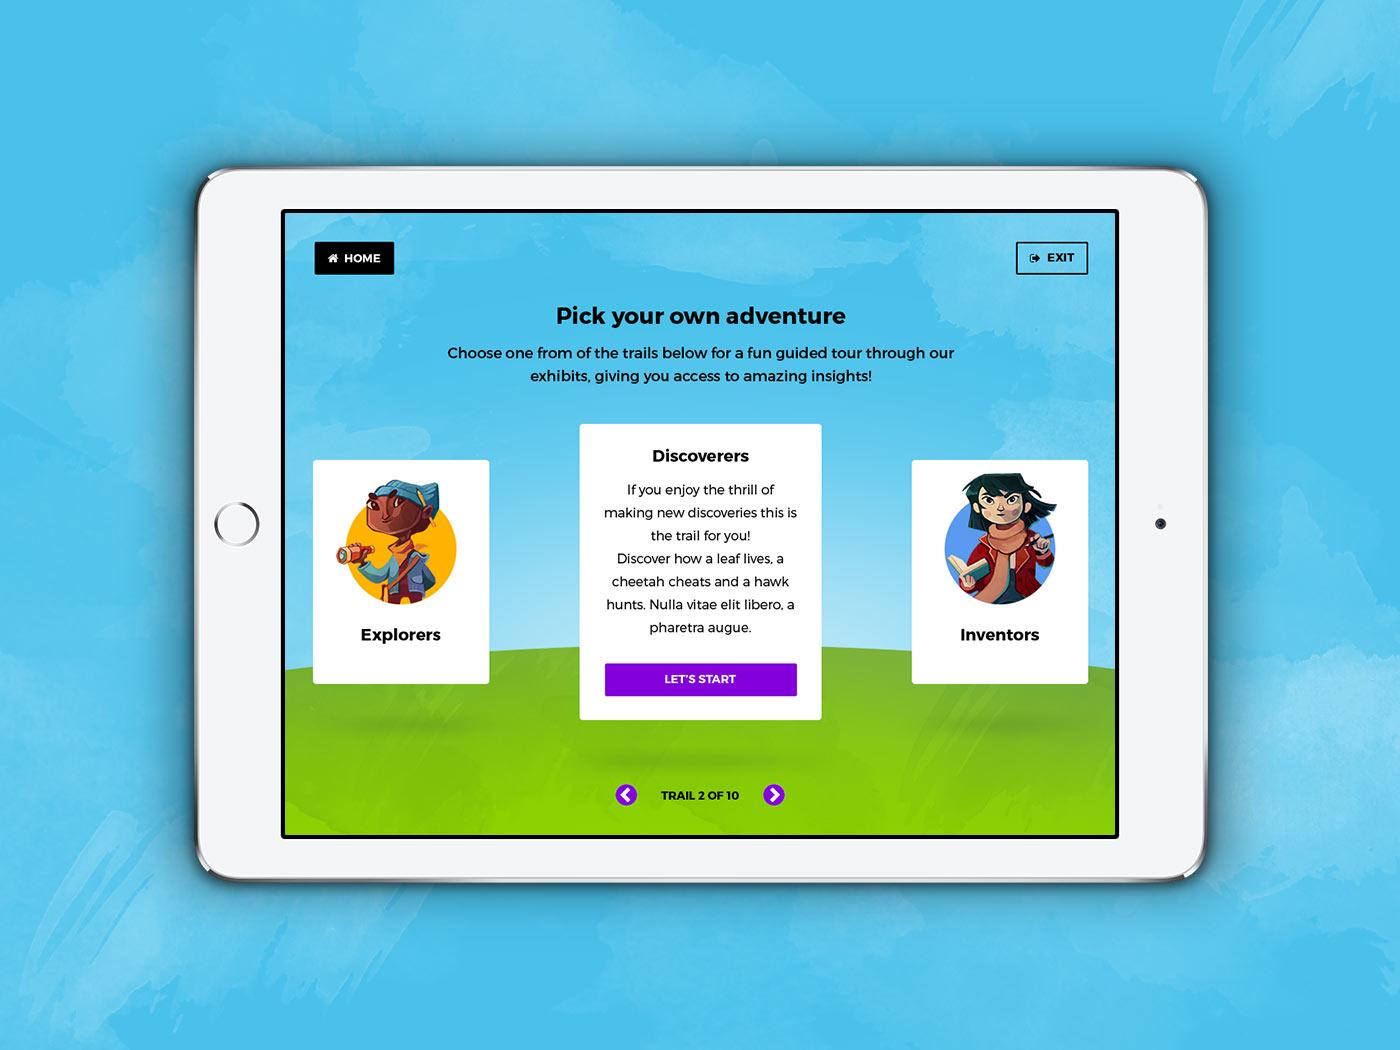 4x3-iPad-land-second-choice-2.jpg